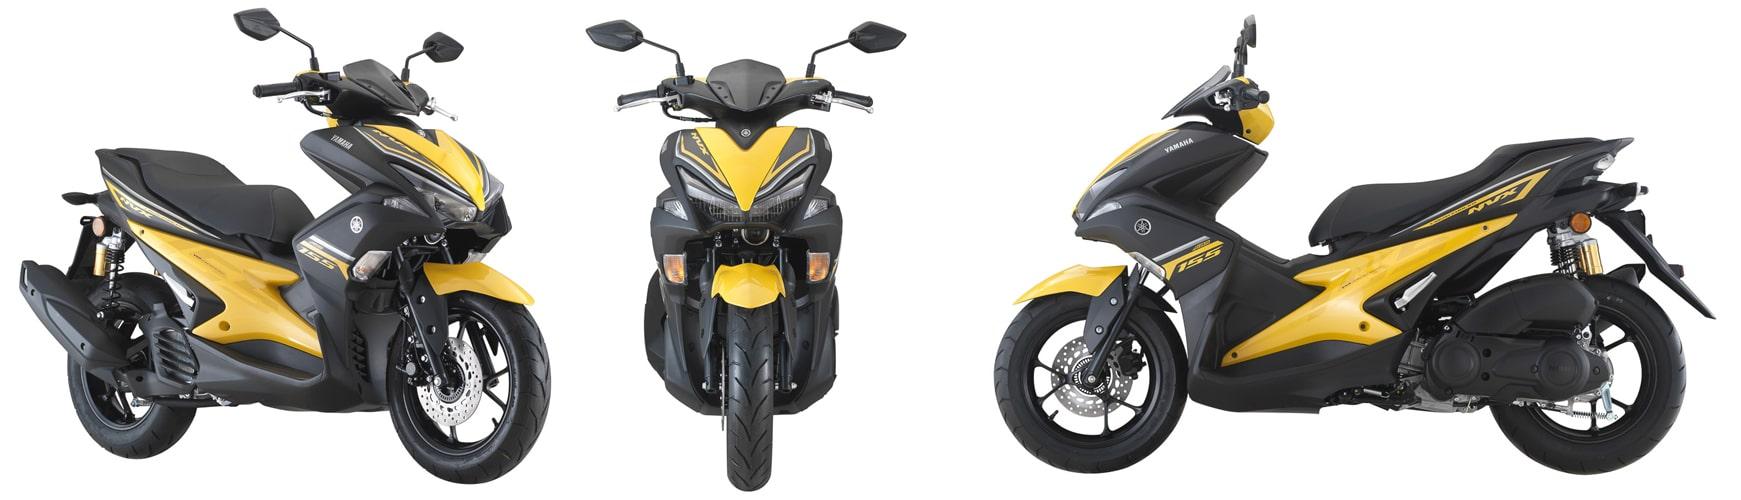 NVX 2020 สีเหลือง